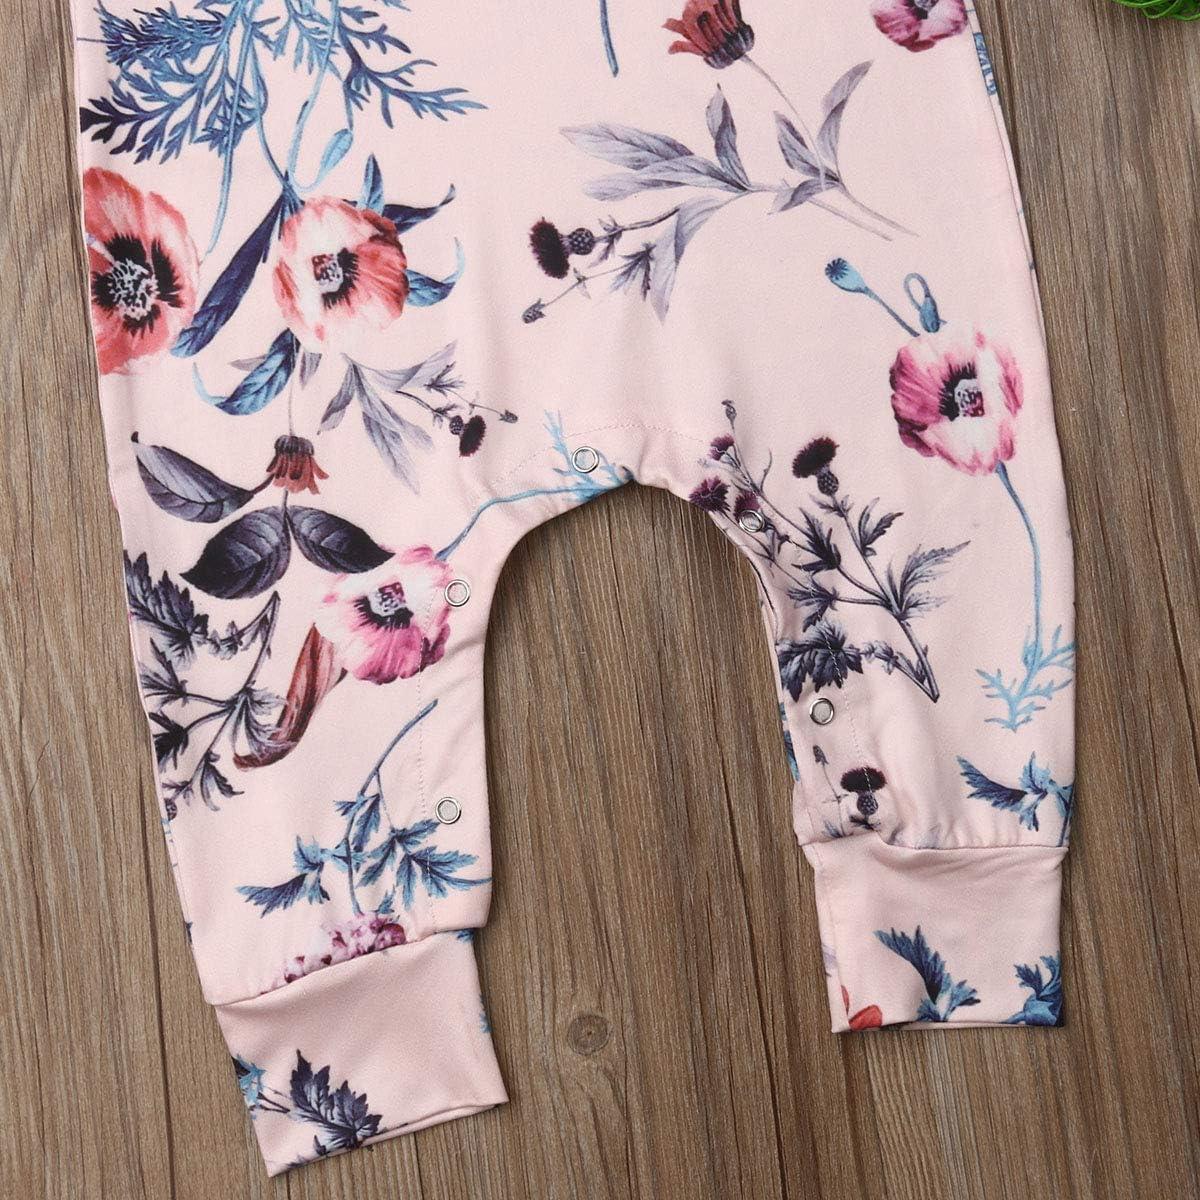 Newborn Baby Girl Floral Printed Romper Outfits Short Sleeve Summer Bodysuit